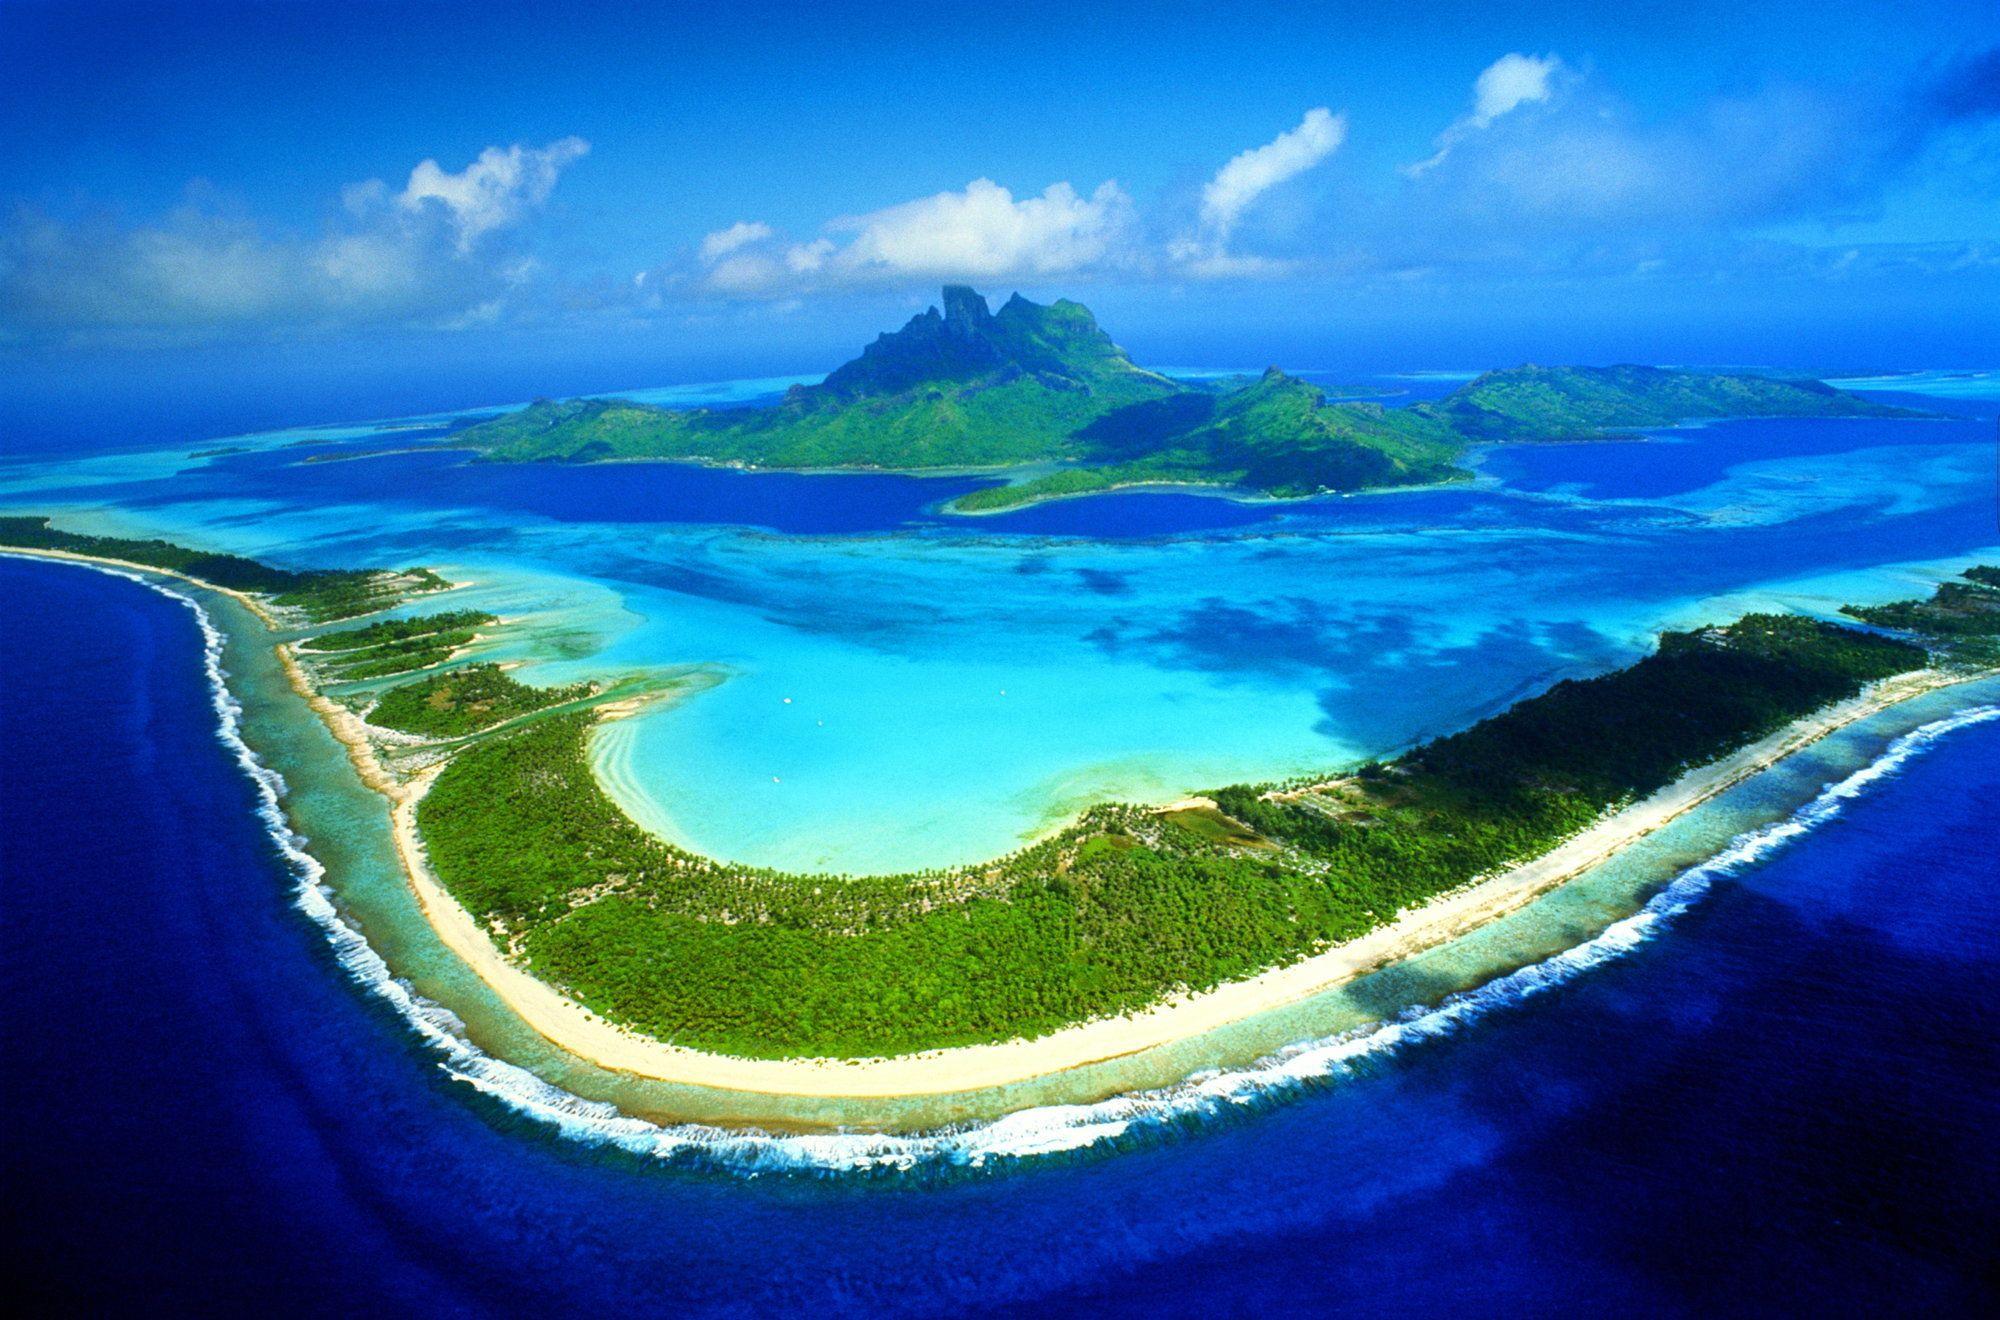 The 10 Best Islands In The World, According To TripAdvisor. Bora Bora